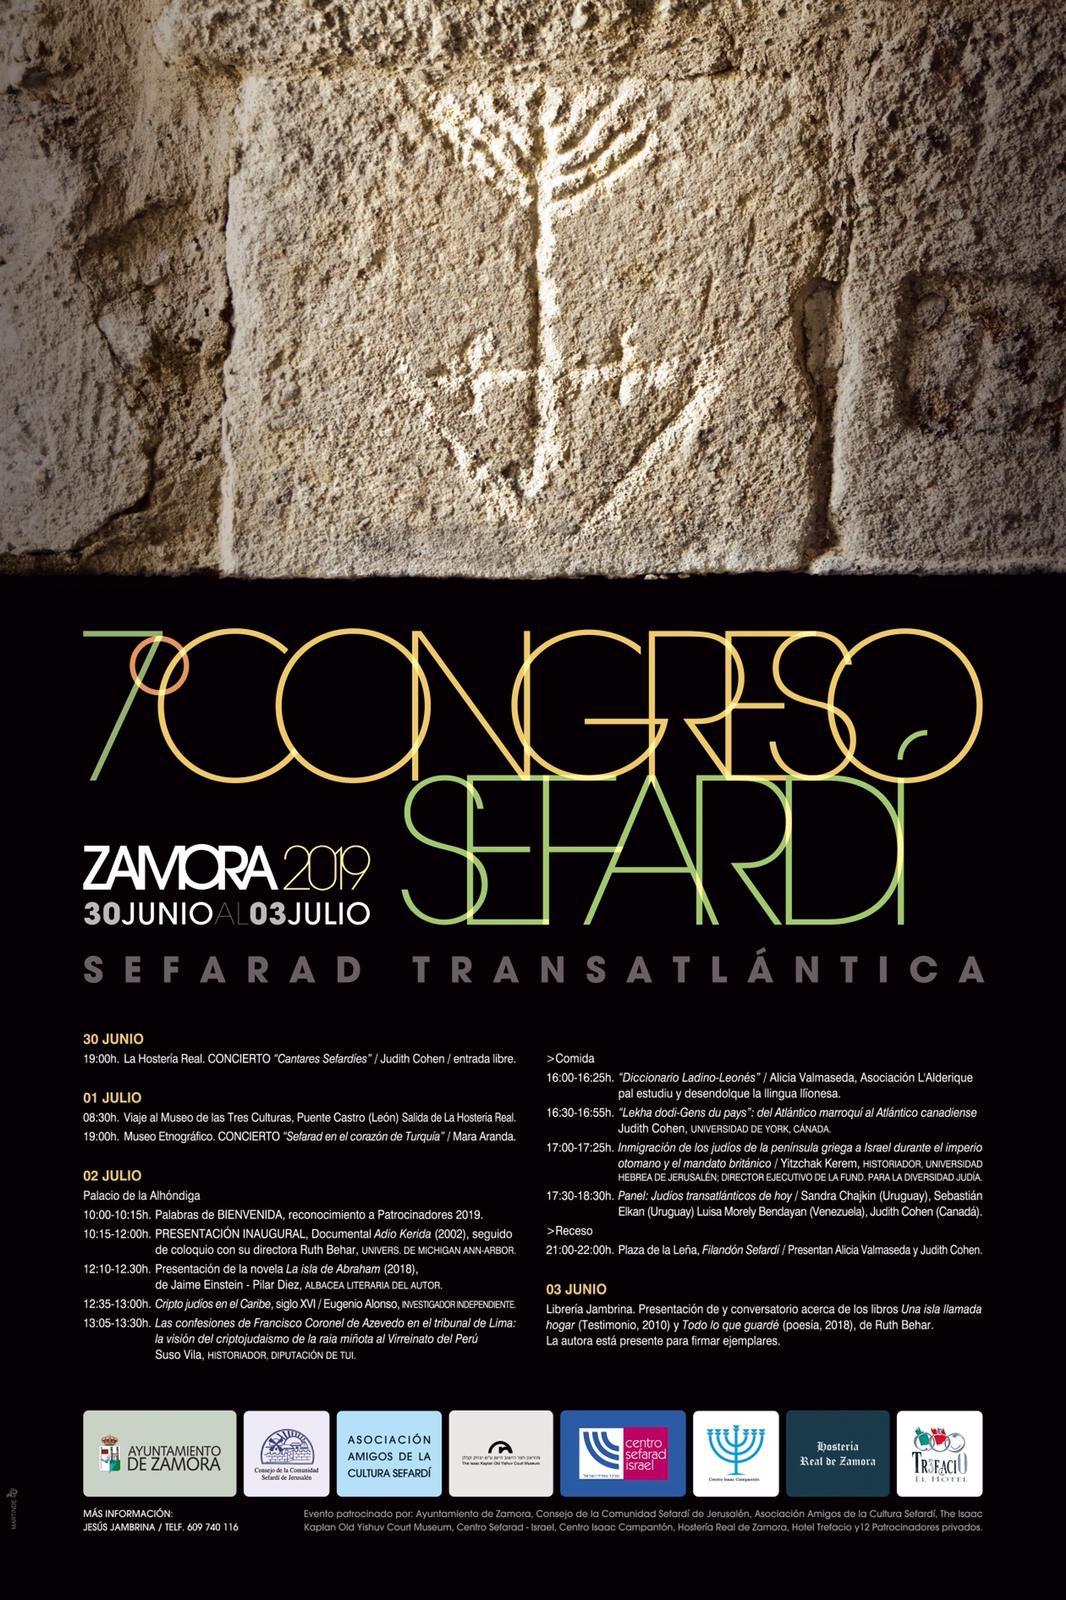 Zamora Transatlántica, 7 congreso sefardí